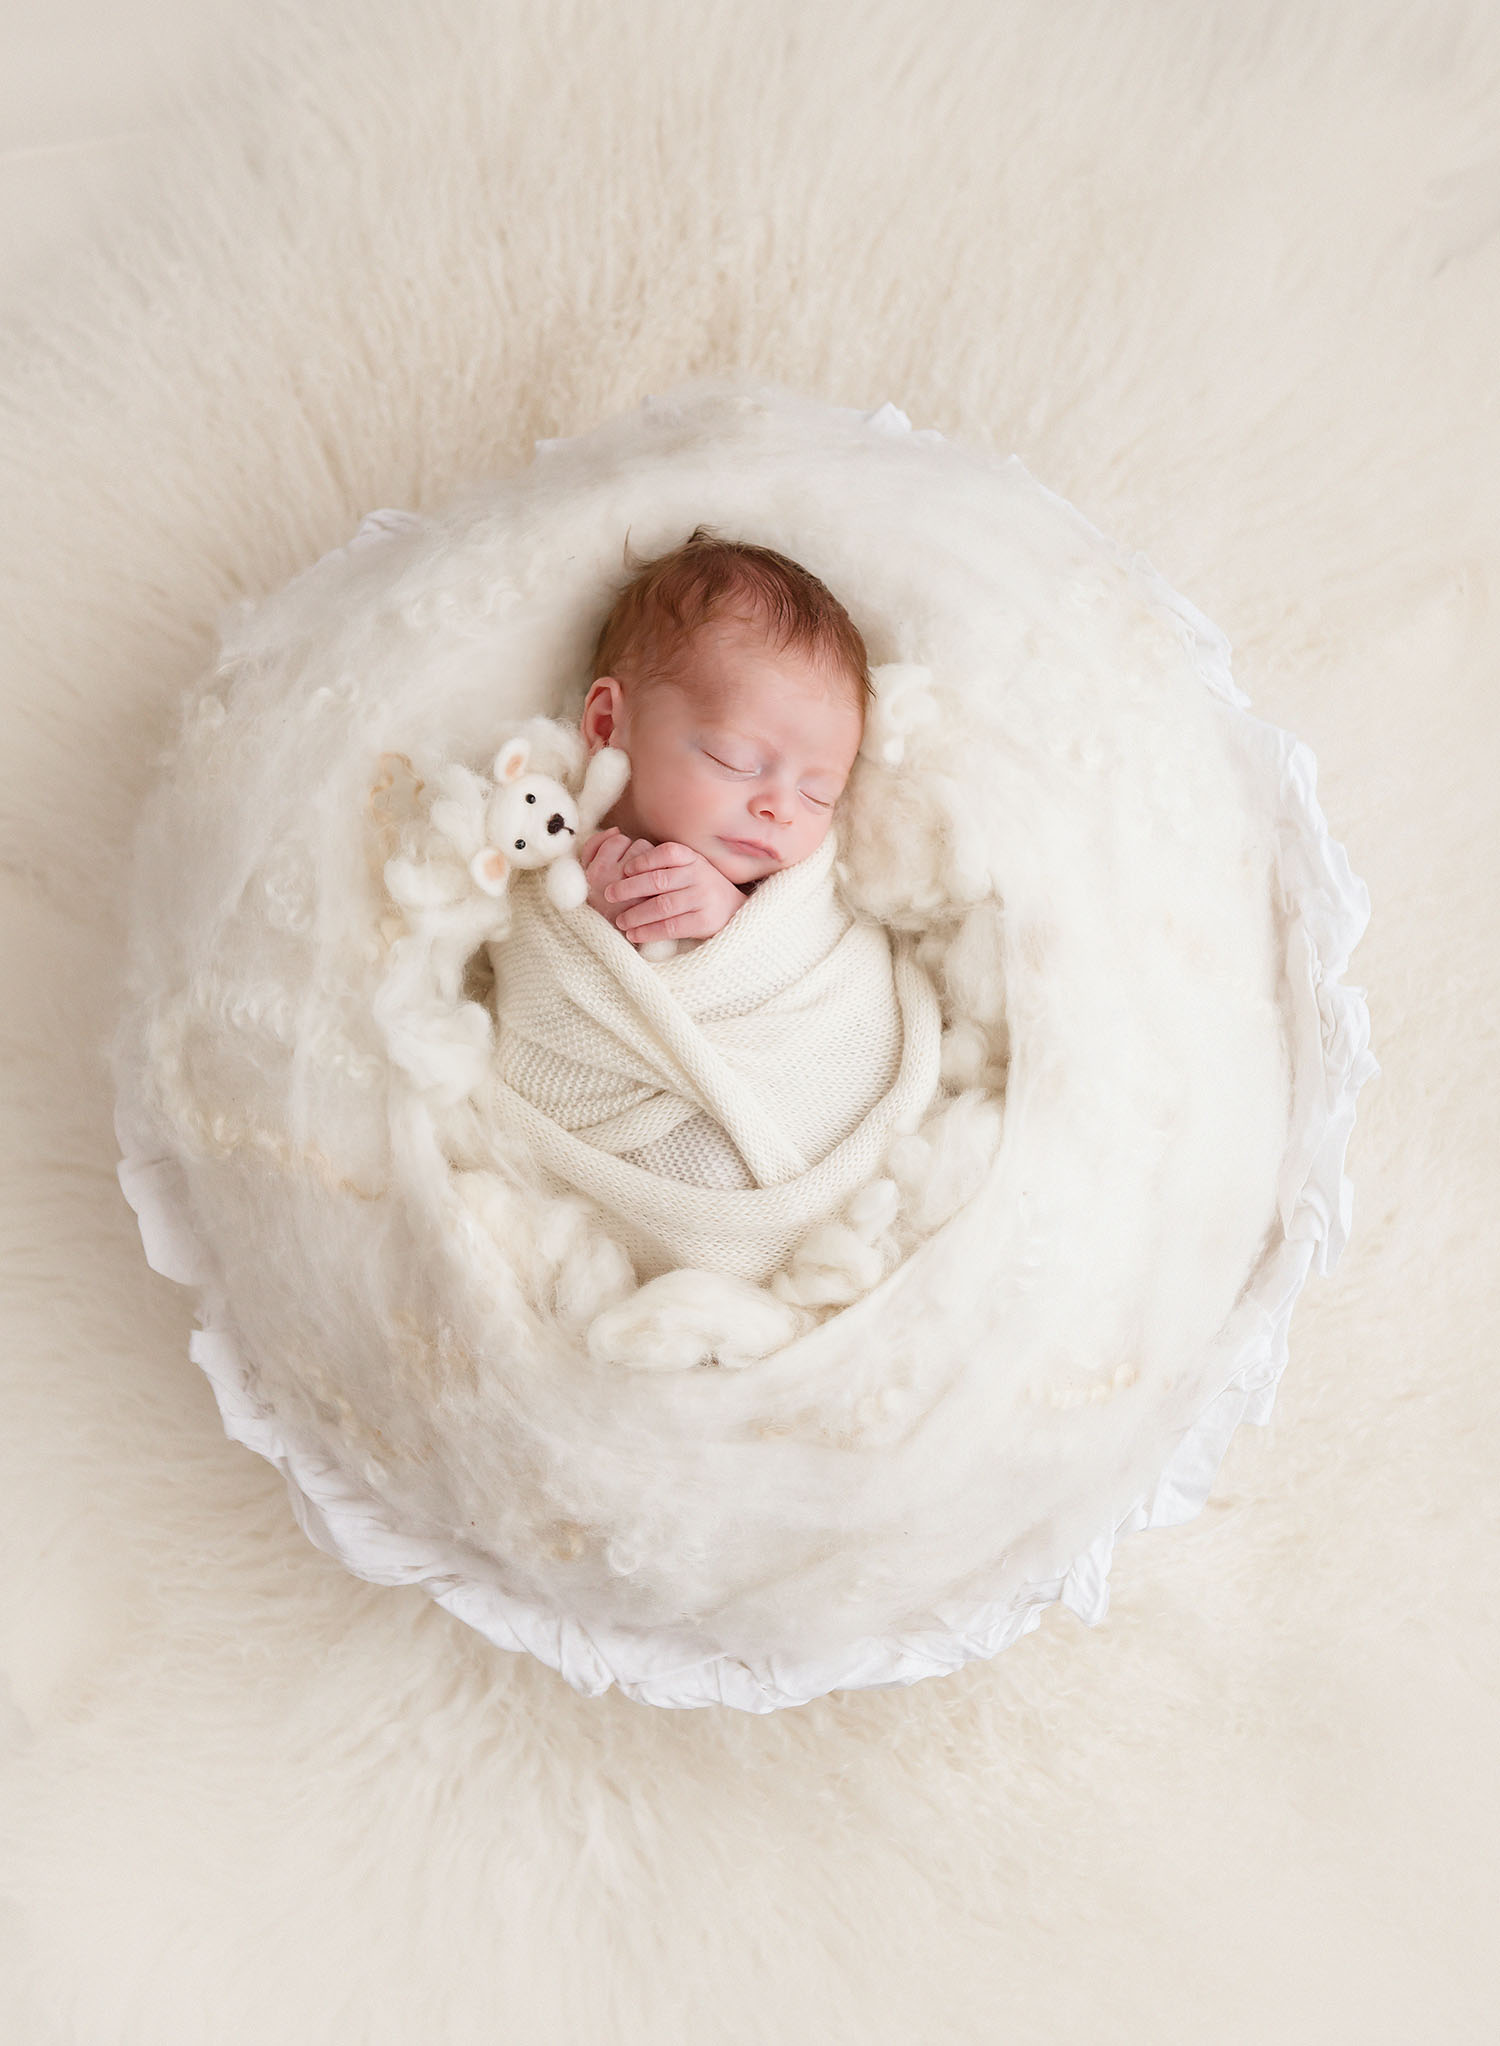 full-service-high-end_Photography_newborn-baby-photographer-richmond-hill-savannah-pooler-hinesville-ga4.jpg